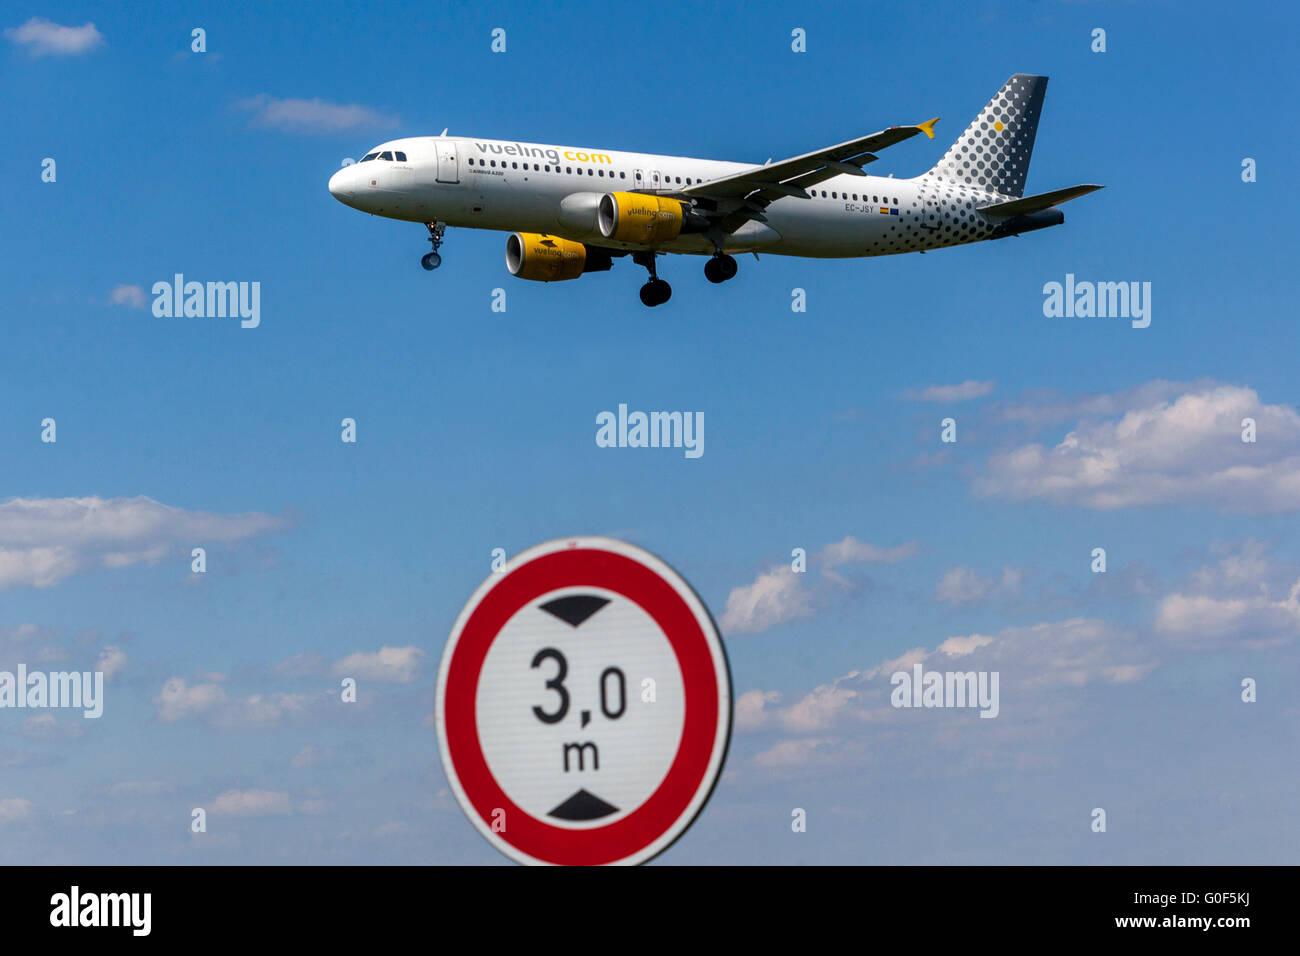 Plane Airbus A320 Vueling approaching for a landing, Prague, Czech Republic - Stock Image